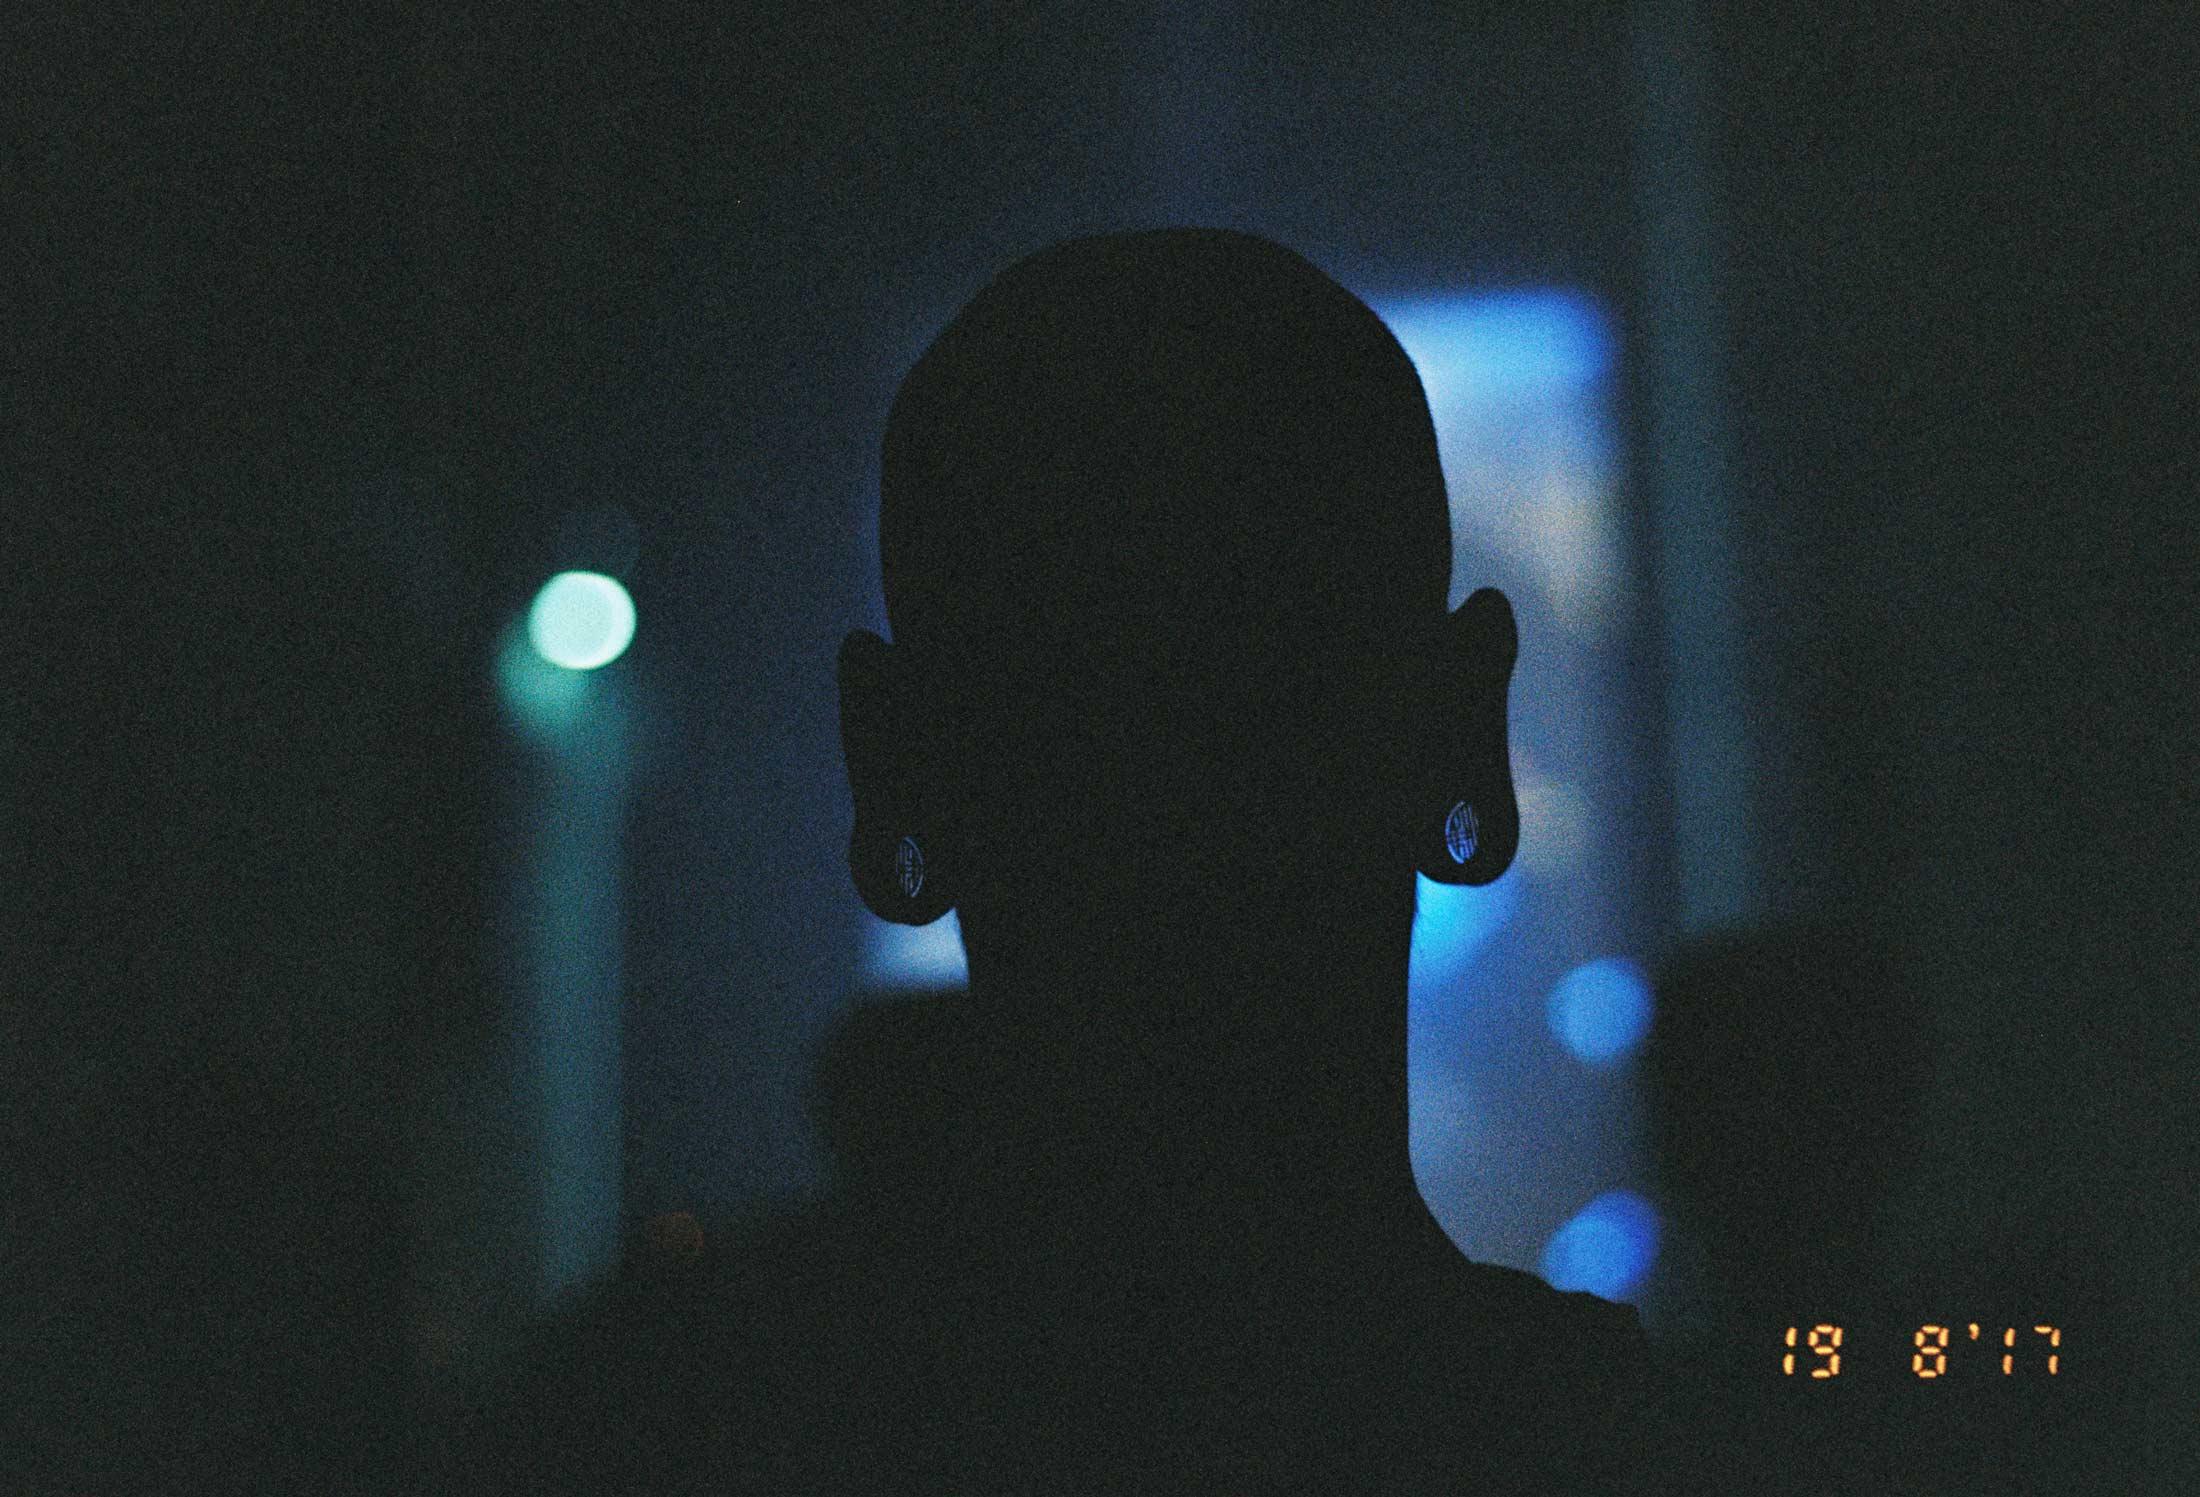 Ear Holes Berlin Underground Techno Tresor Ohm Rave Nightlife